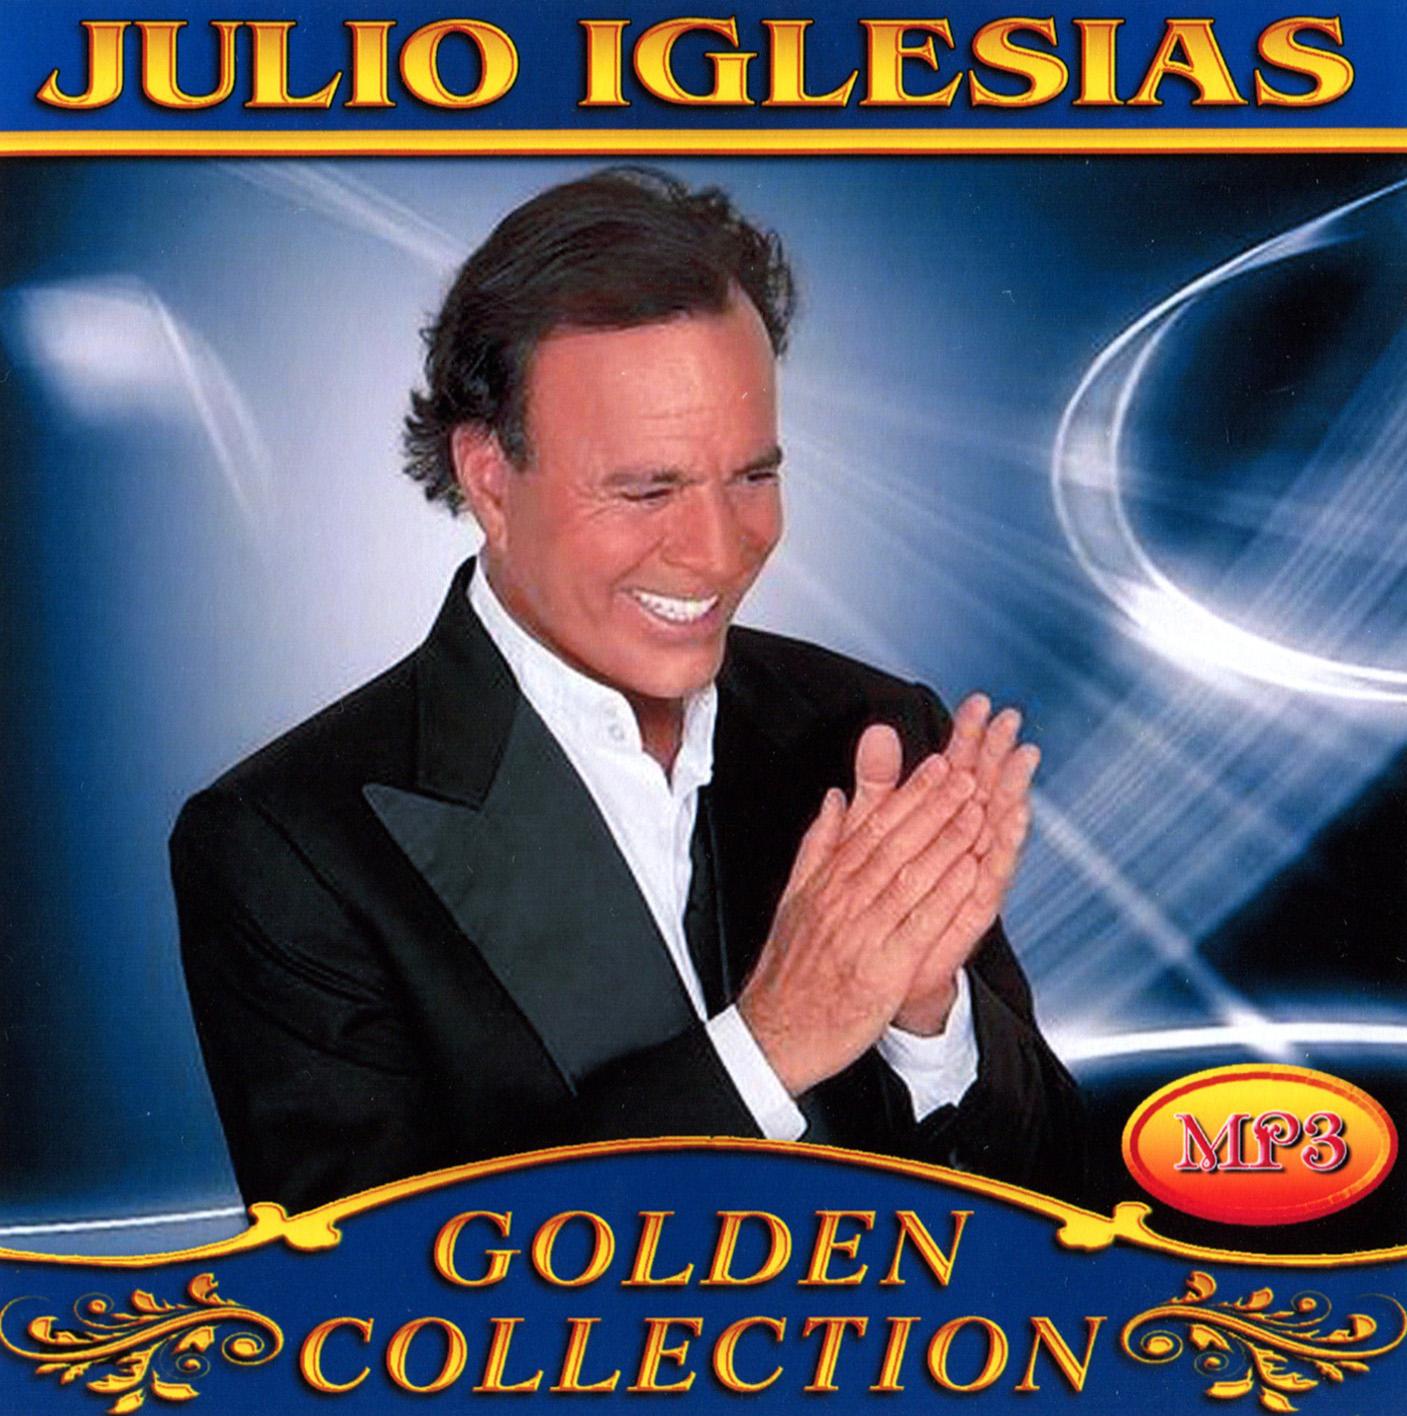 Julio Iglesias [mp3]